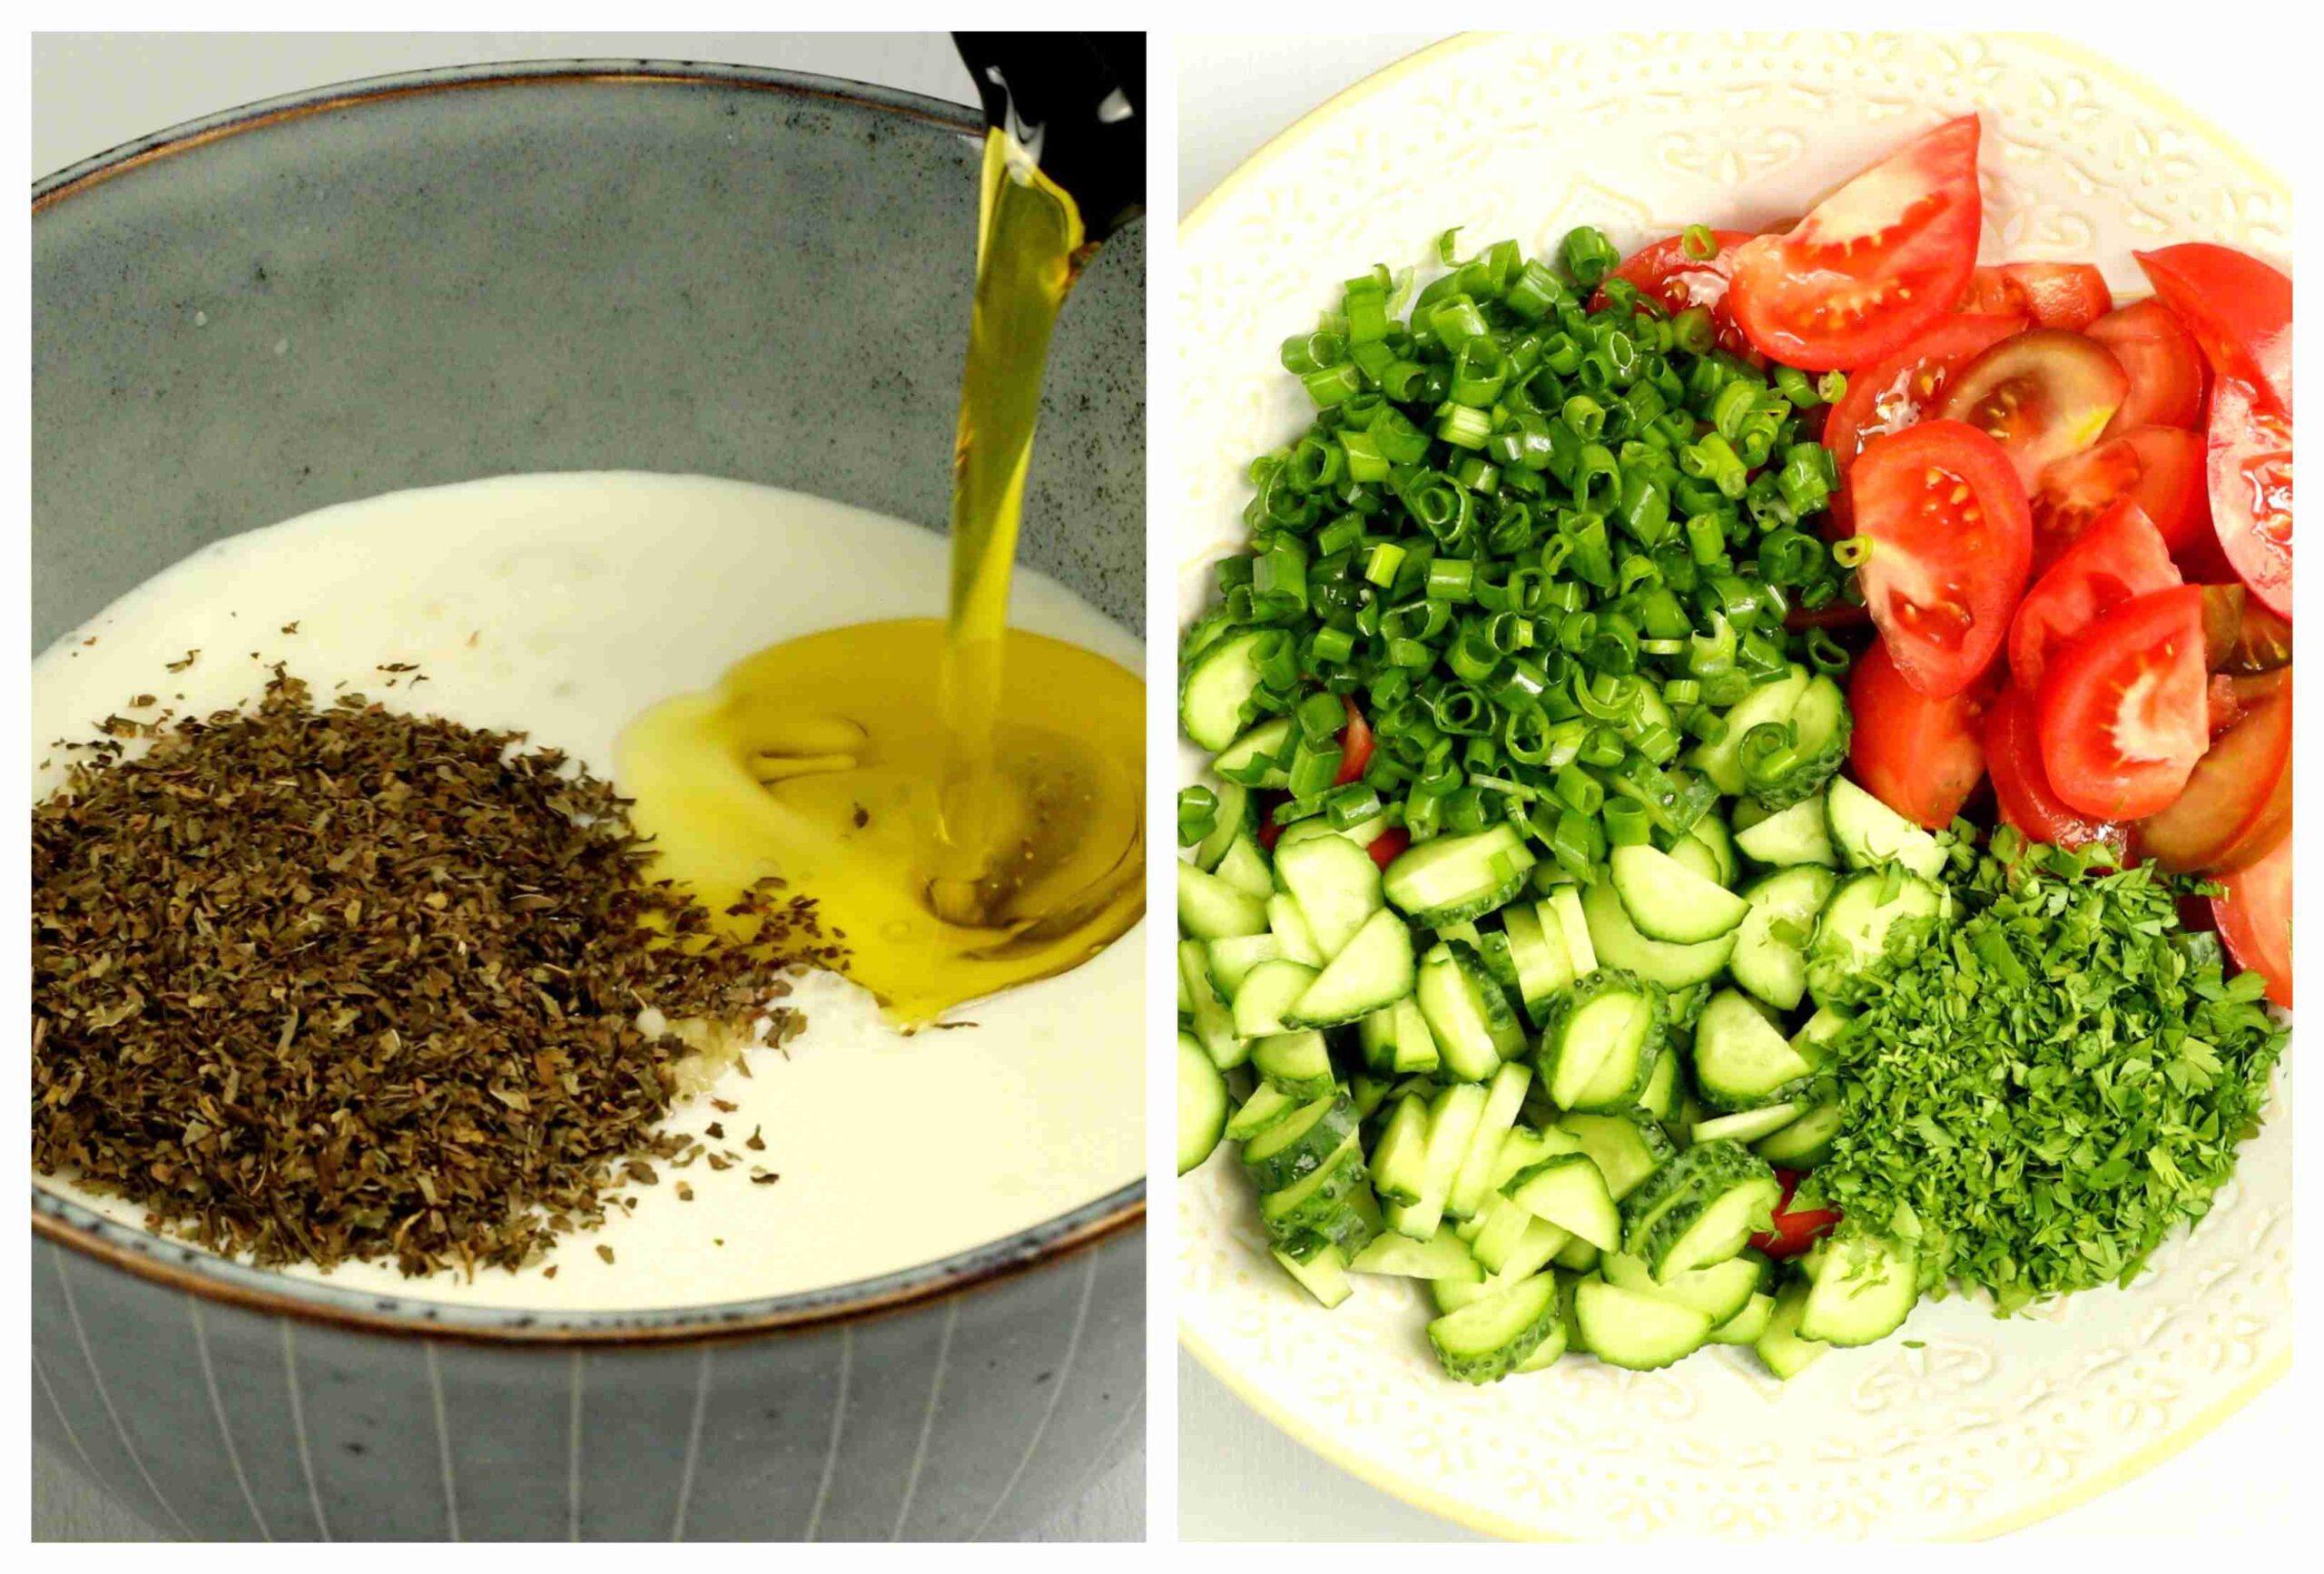 Fattoush salad cooking process images